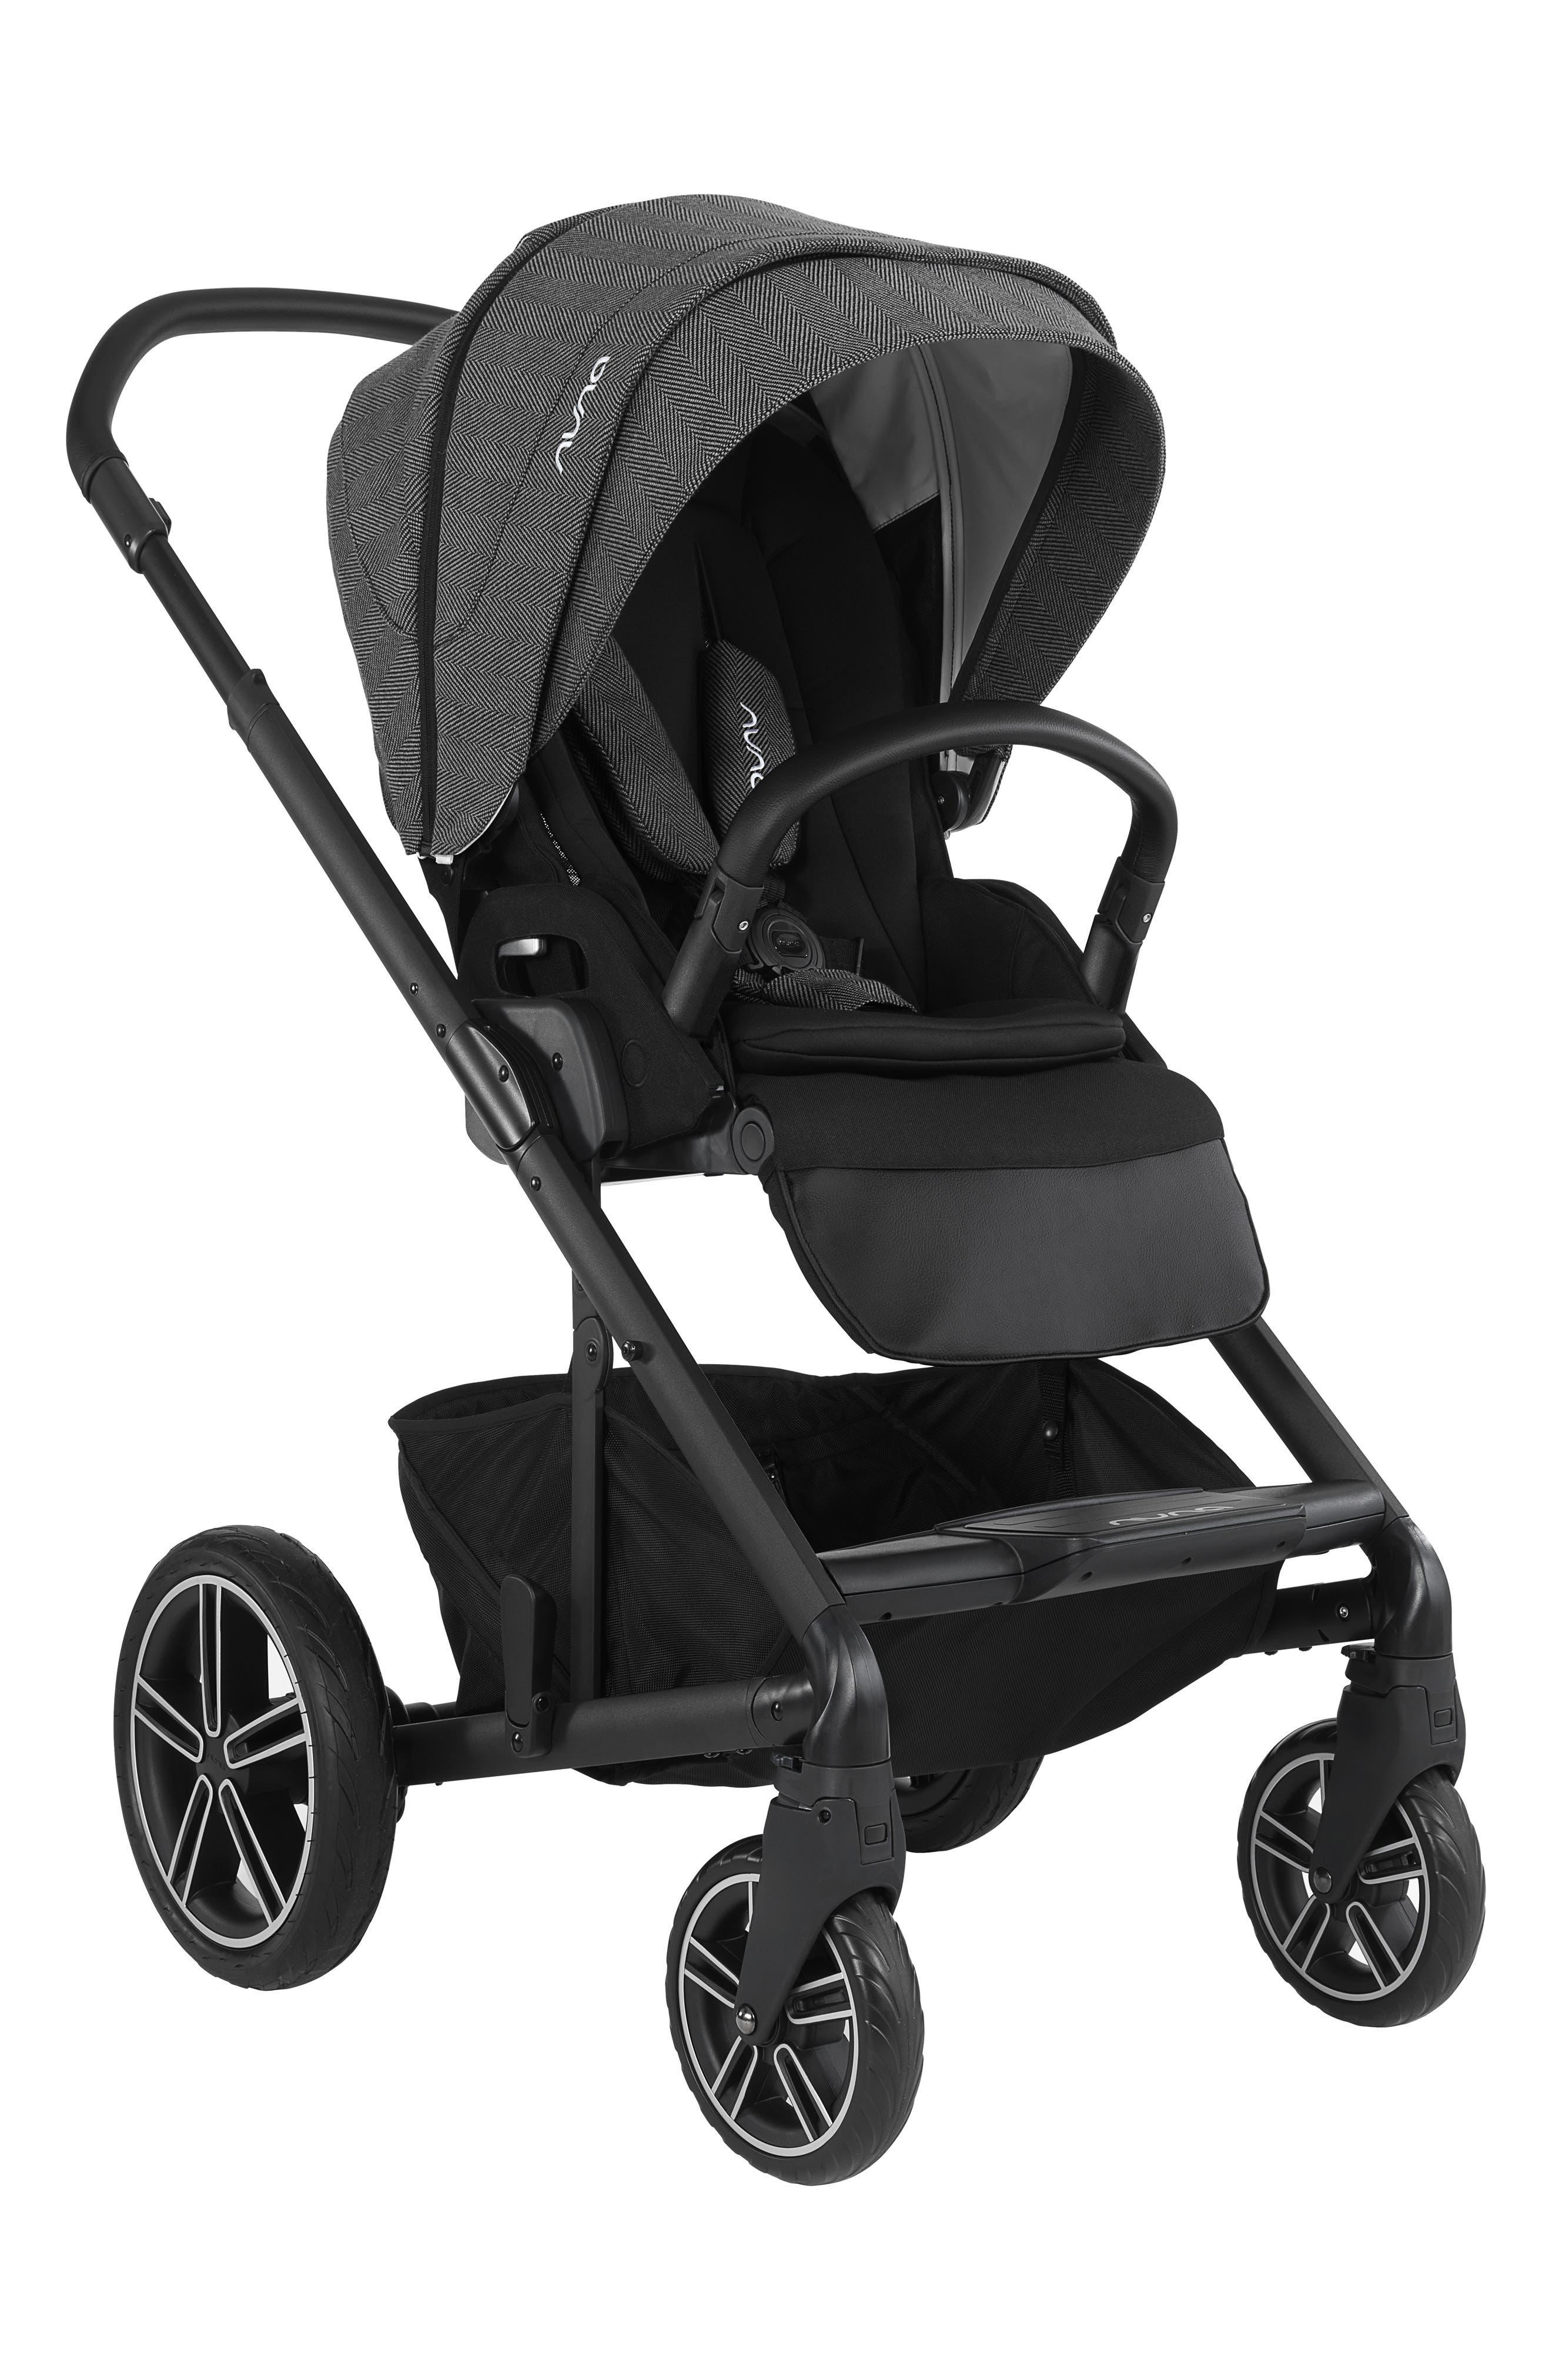 2019 MIXX<sup>™</sup> Stroller & PIPA<sup>™</sup> Lite LX Infant Car Seat Set Travel System,                             Alternate thumbnail 11, color,                             VERONA CAVIAR